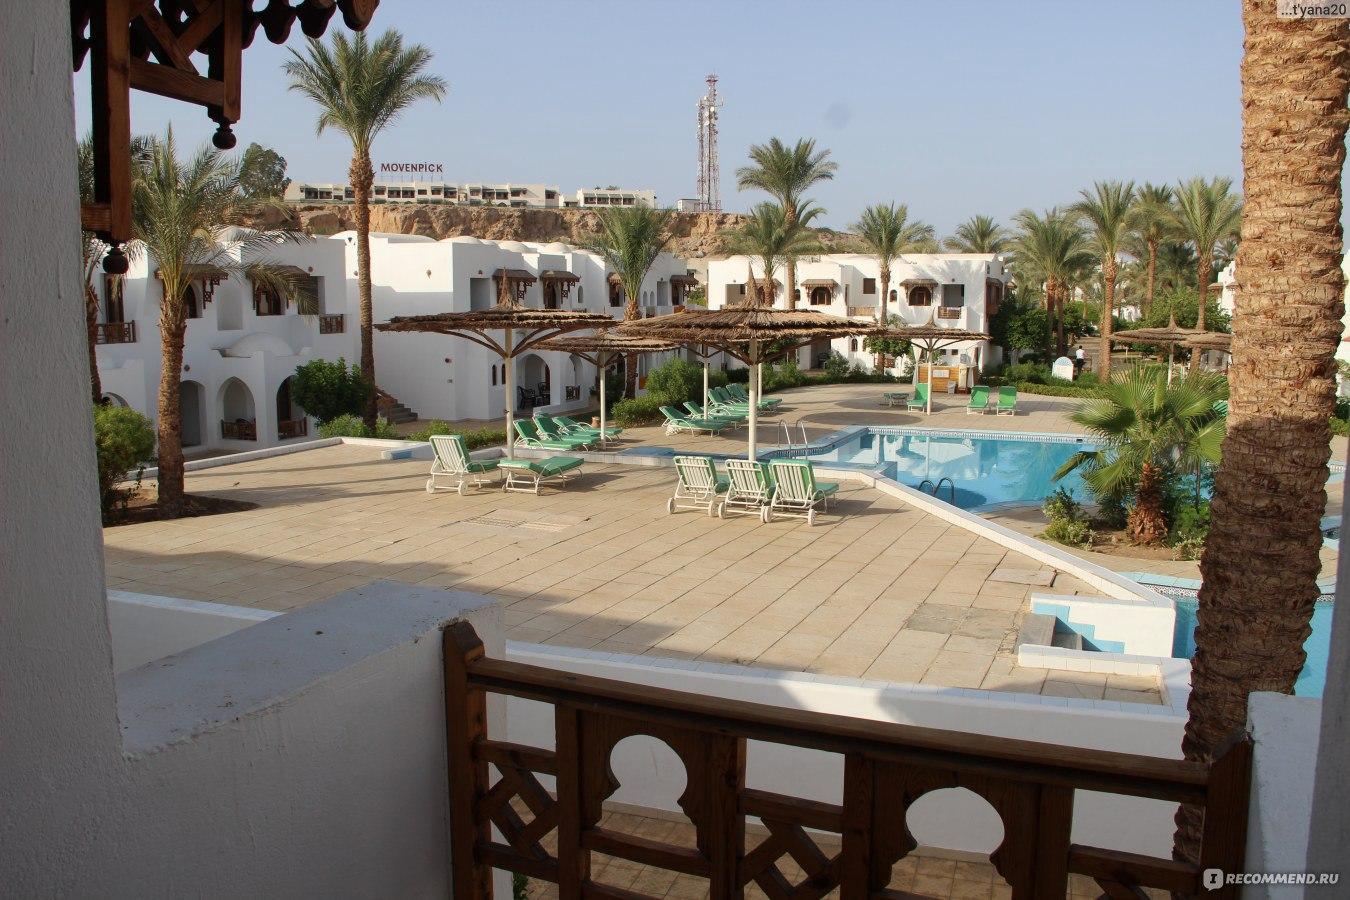 egipet-otel-sanesta-bit-resort-end-kazino